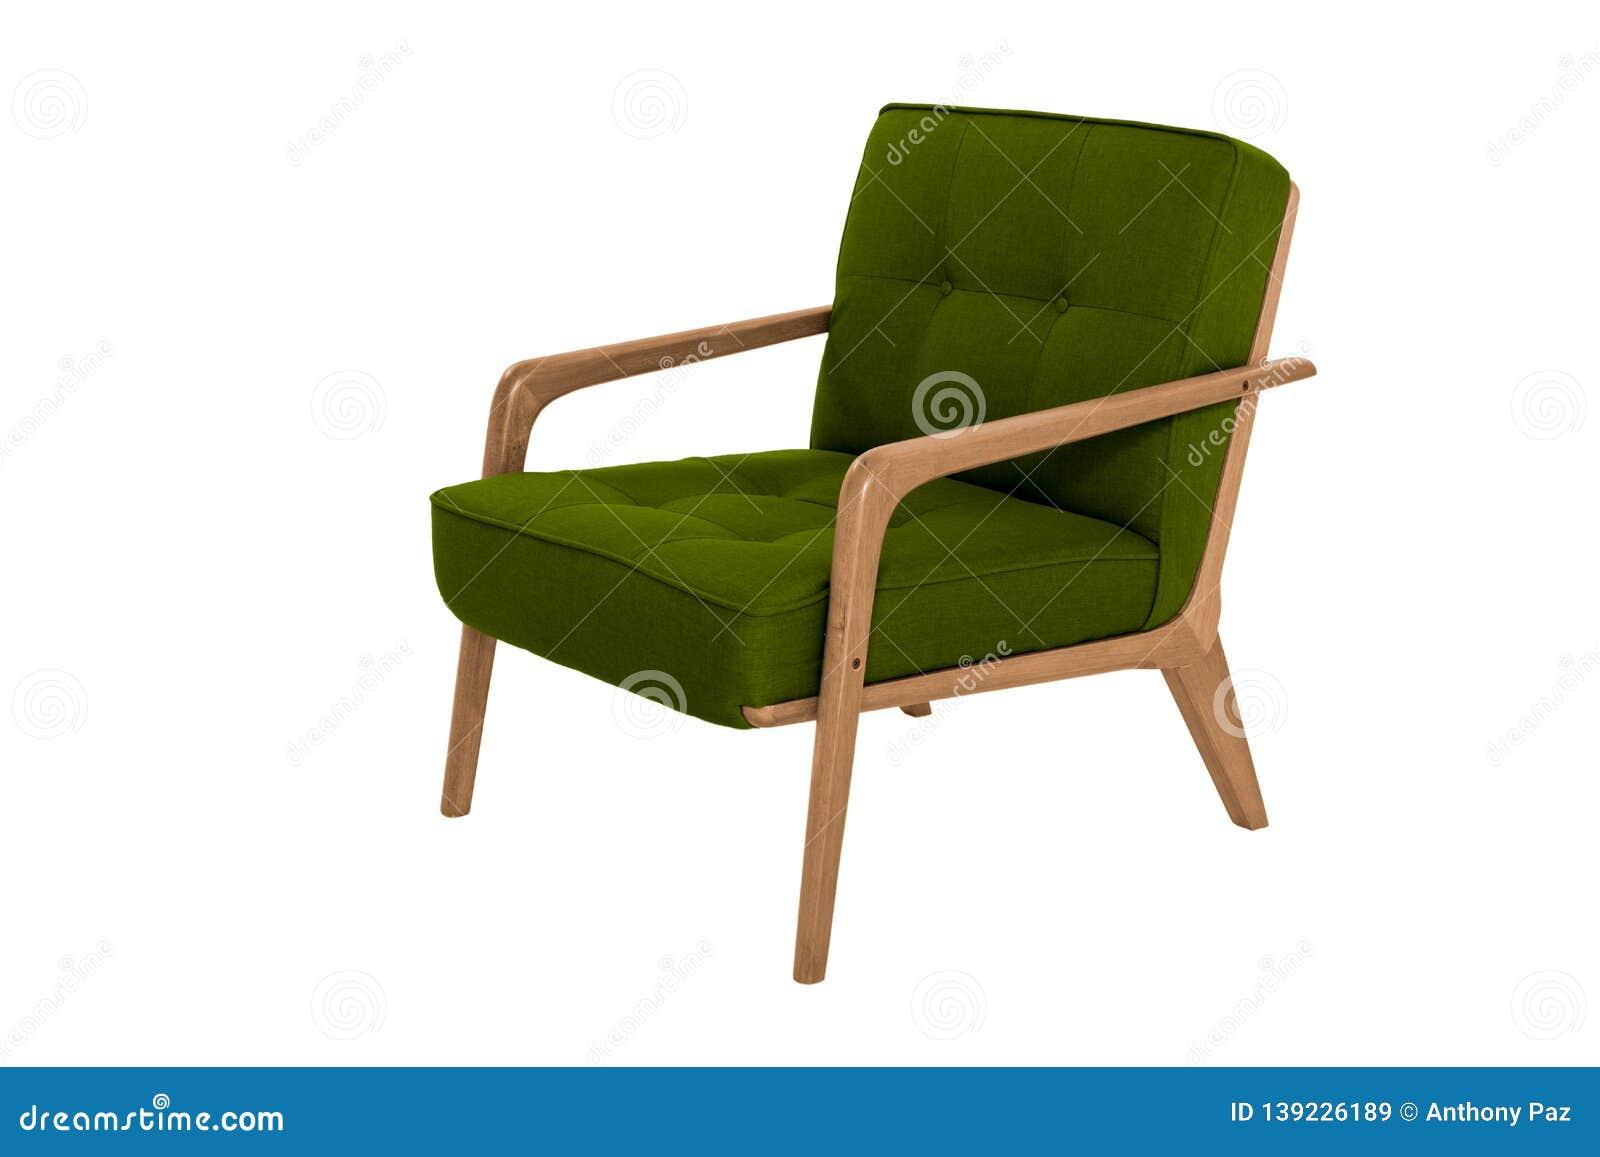 green fabric wood armchair modern designer chair white background texture